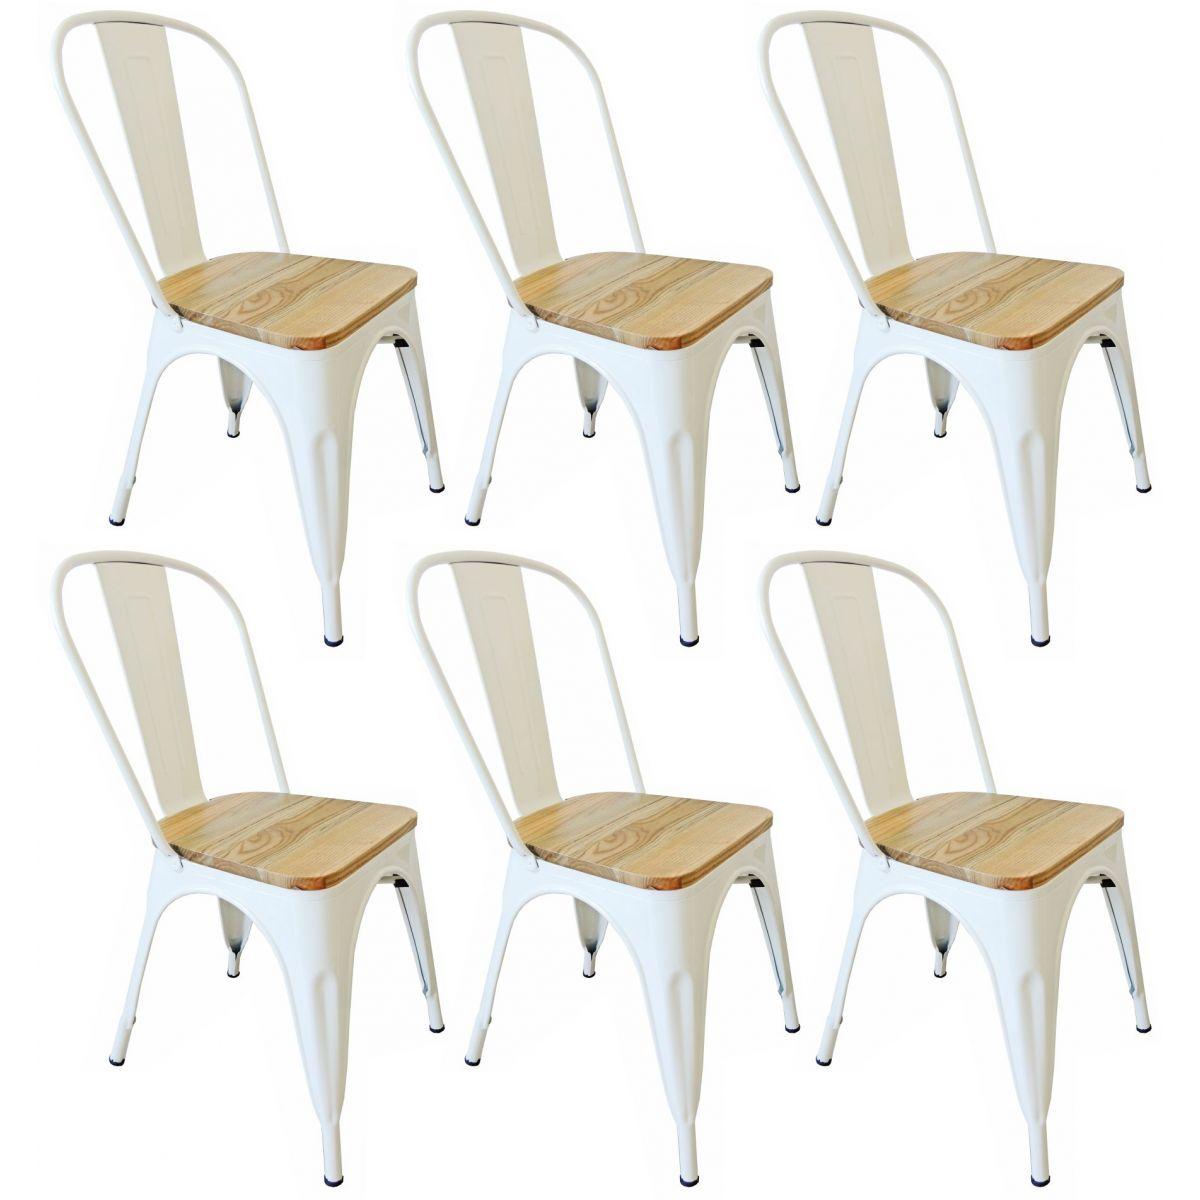 Kit 6 Cadeiras Design Tolix Metal Assento em Madeira Pelegrin PEL-1520